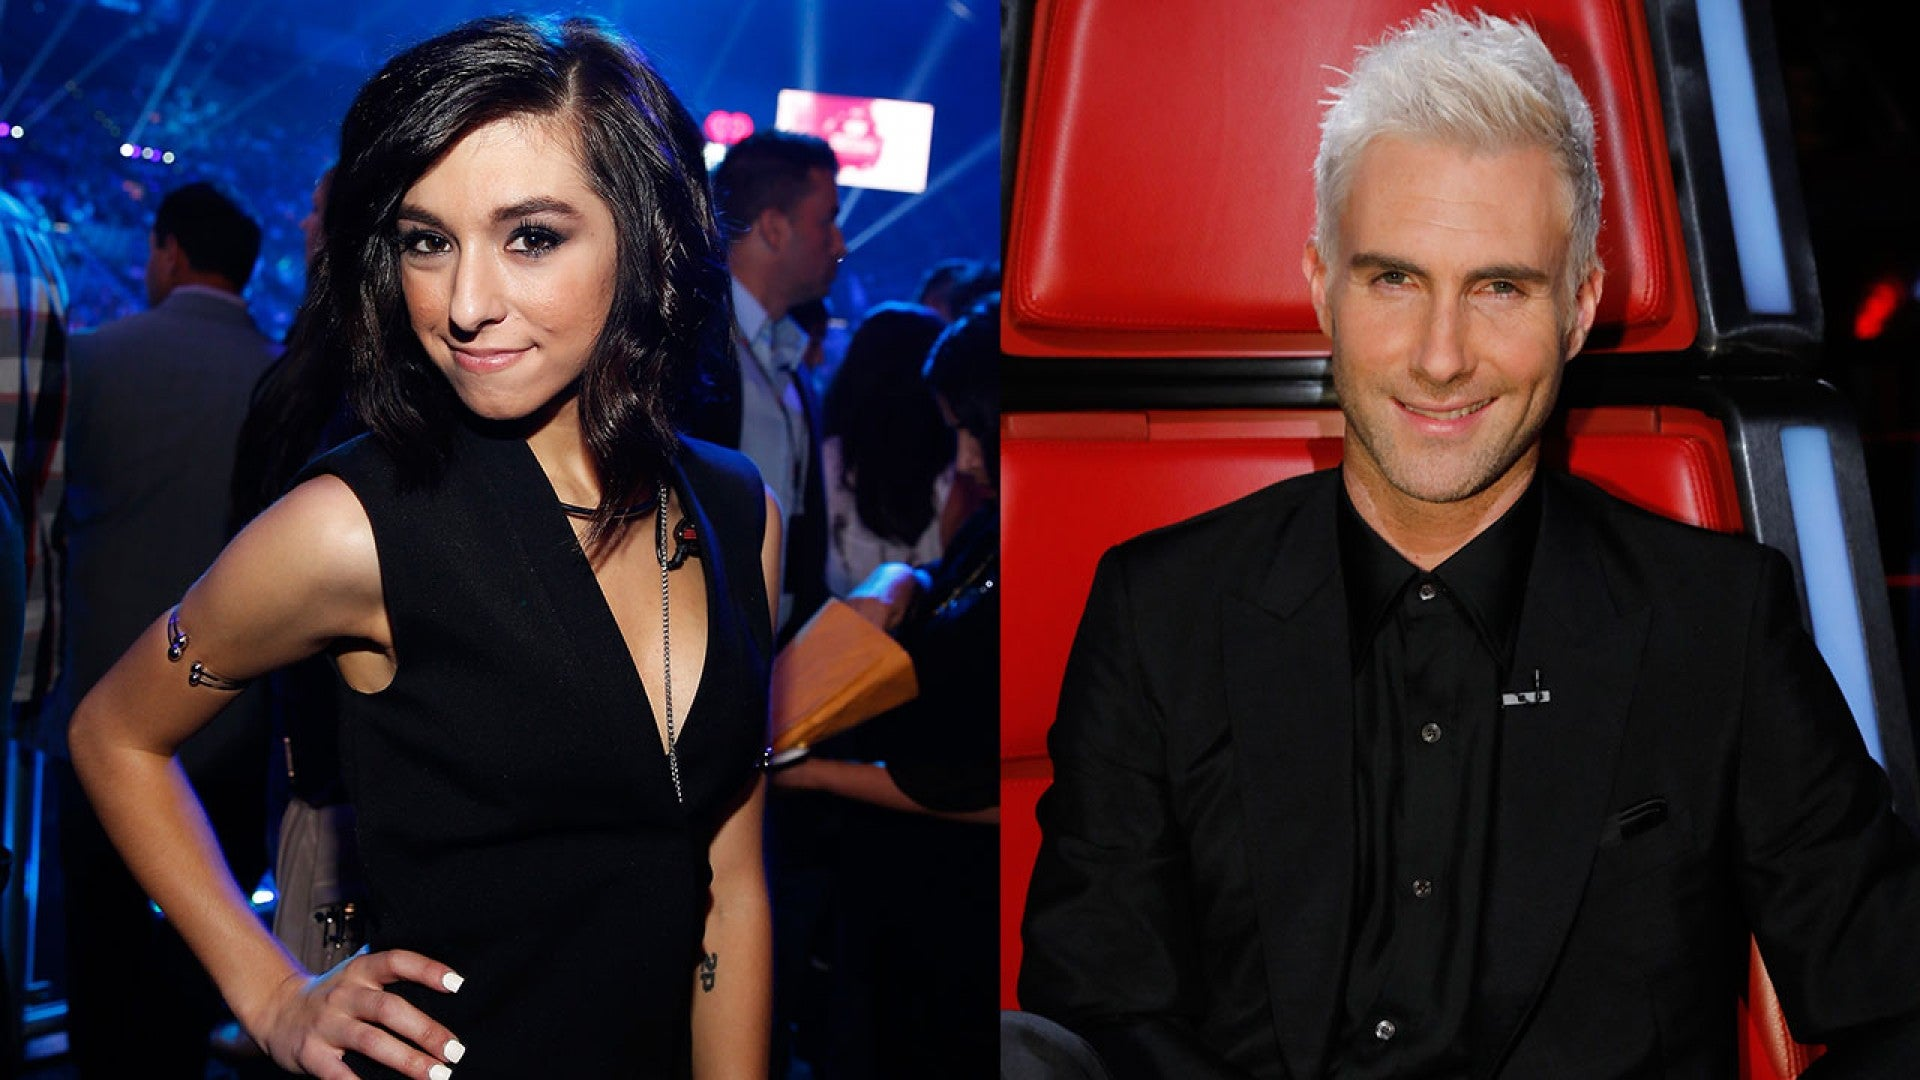 Christina grimmie dating Adam Levine dating Cowboys verkossa